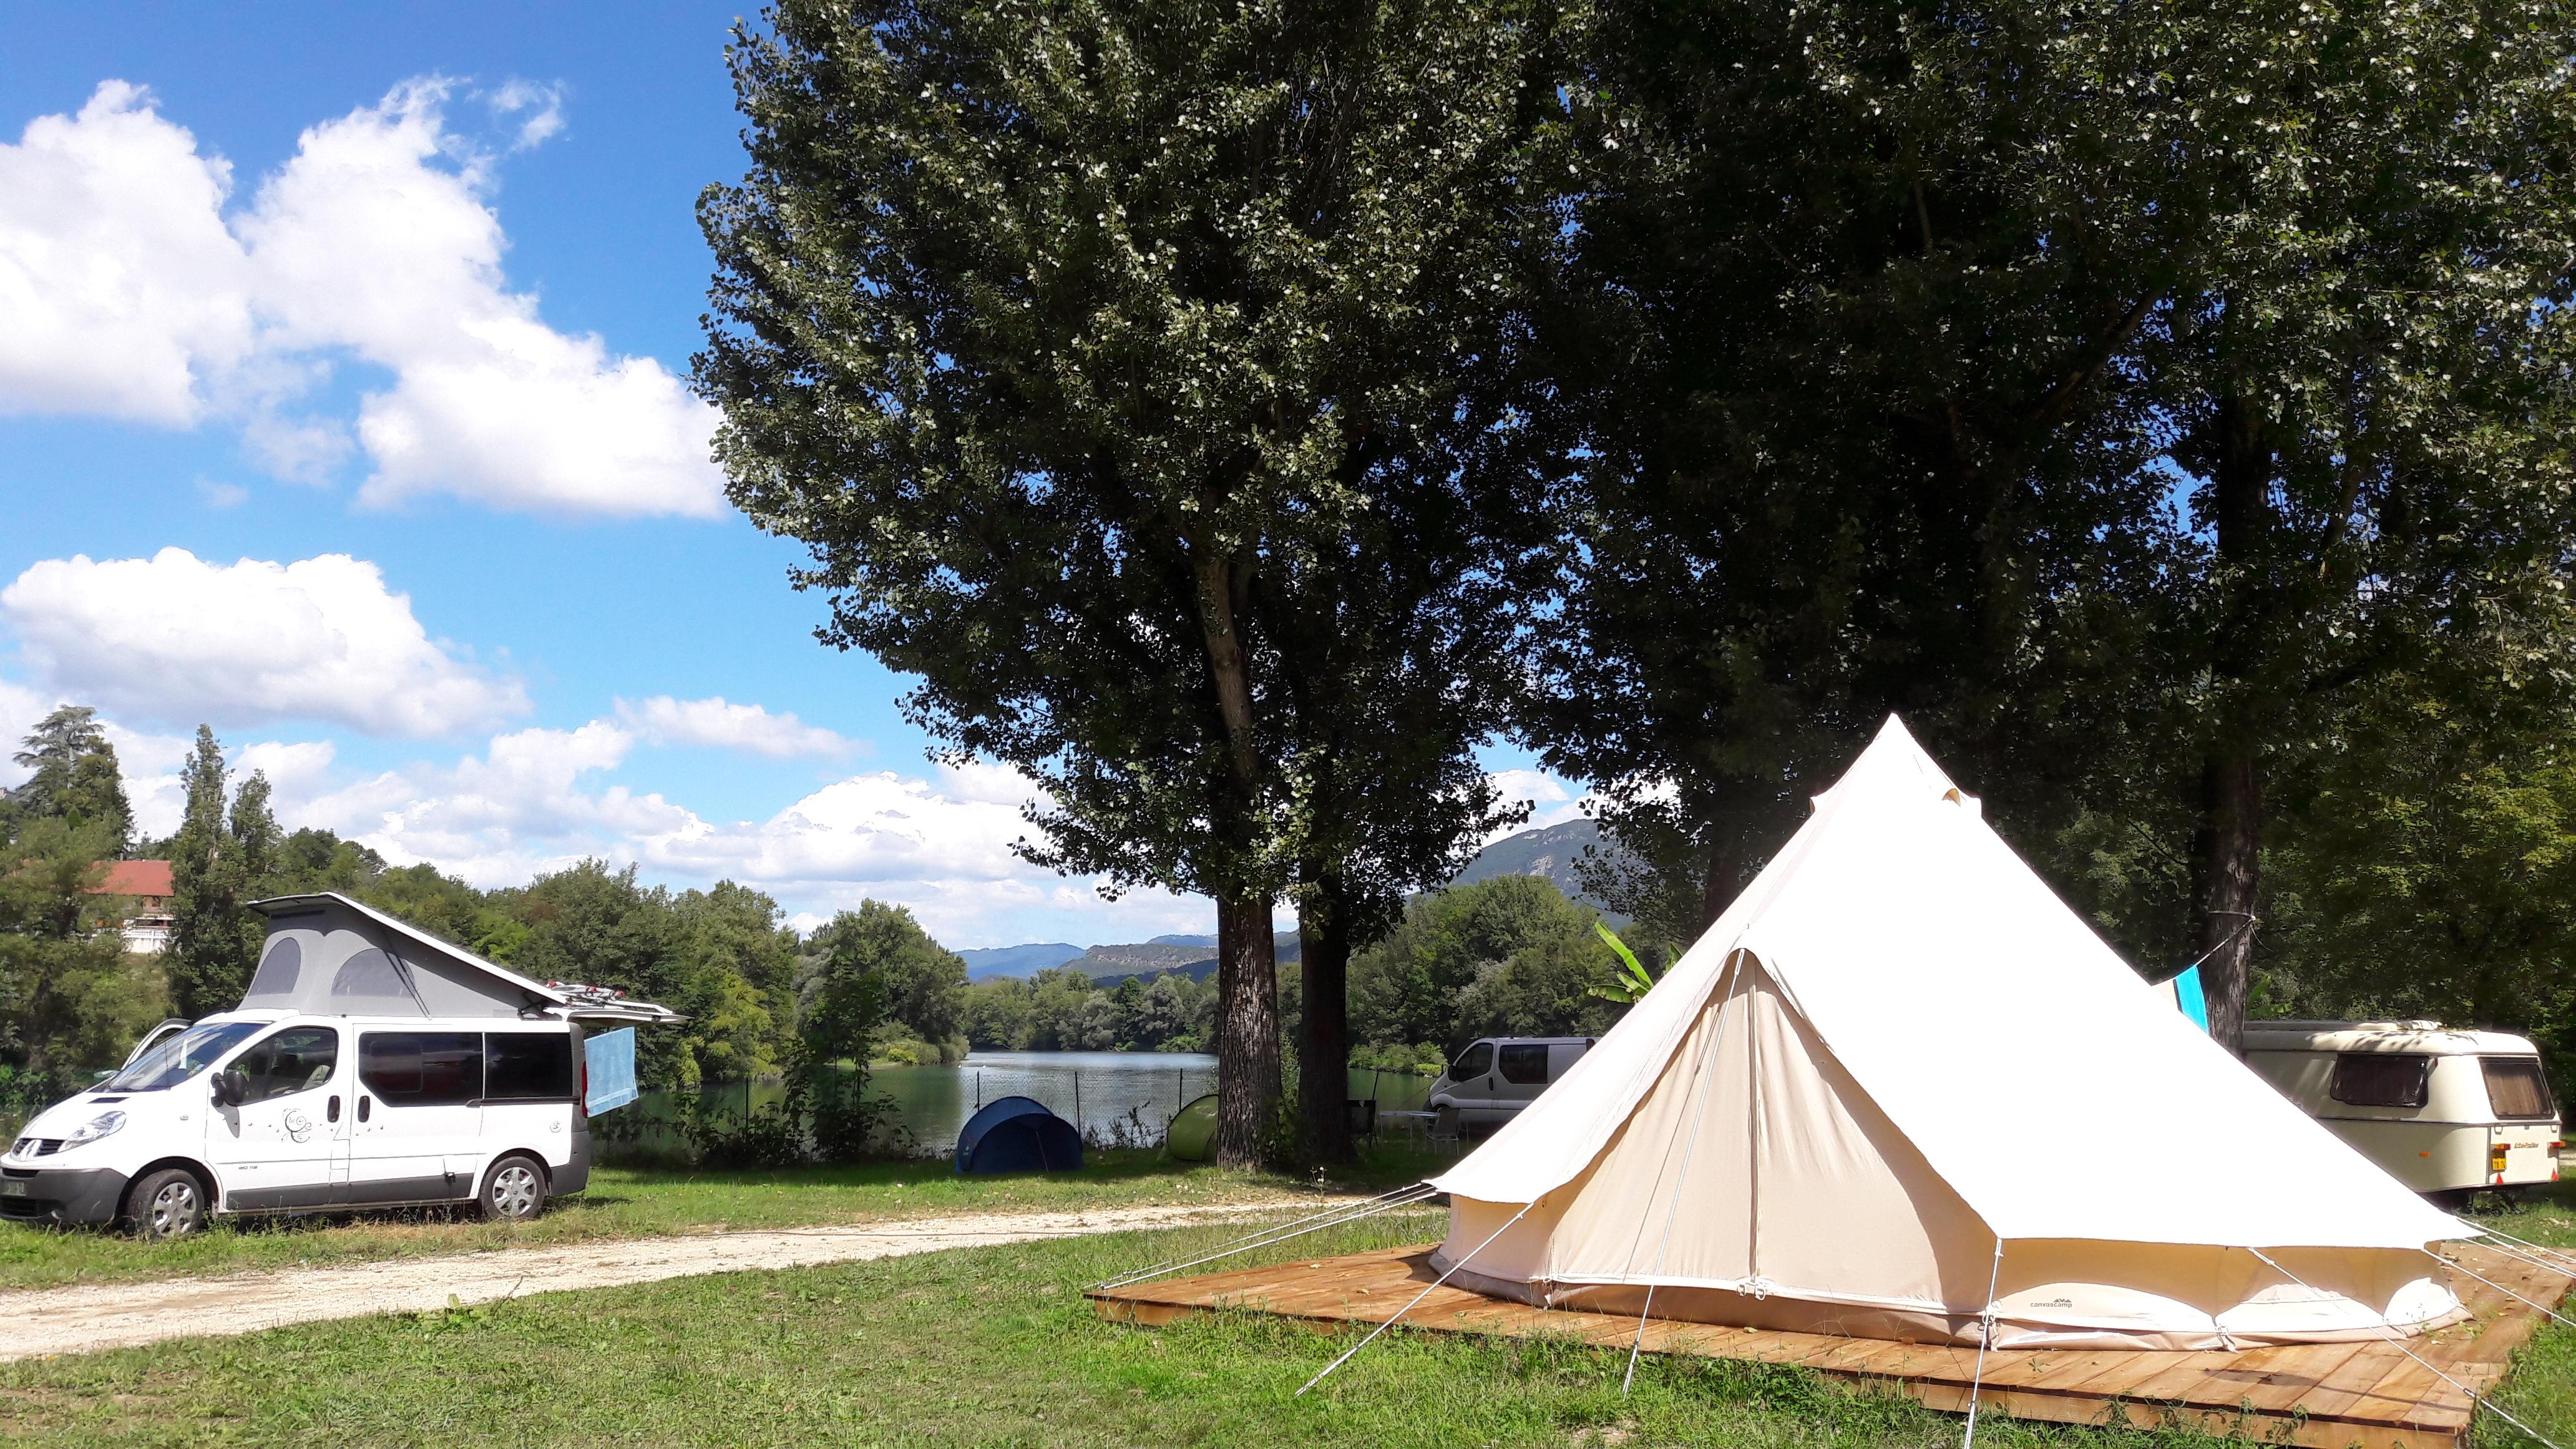 Kanoti Camping Haut Rhone Sauvage Pays du Lac Aiguebelette Savoie.jpg